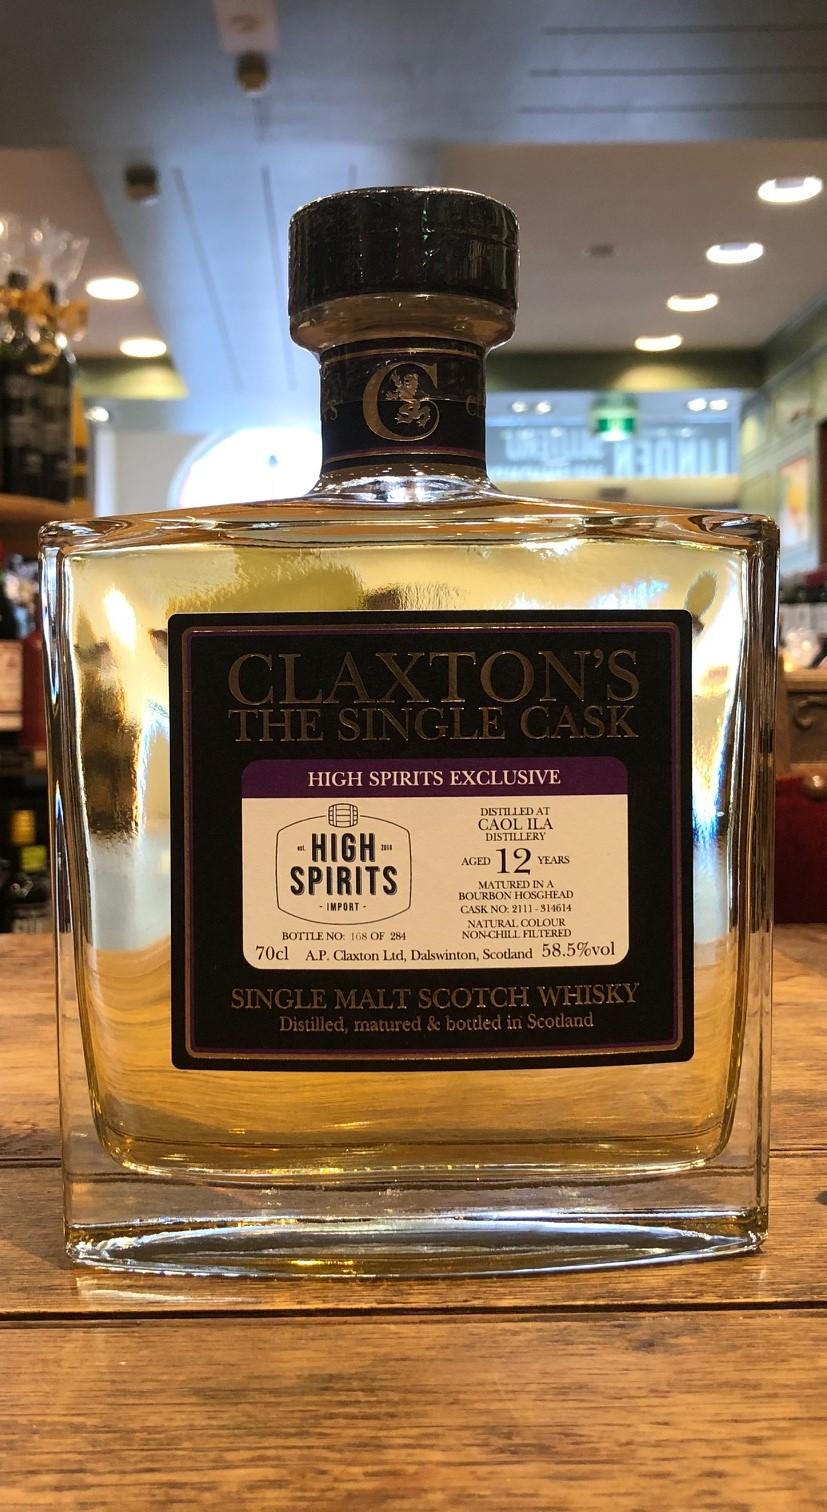 Claxton's | The Single Cask Range for HS | Caol Ila | 2007 | Islay | refill Bourbon cask |  12y | 58,5%